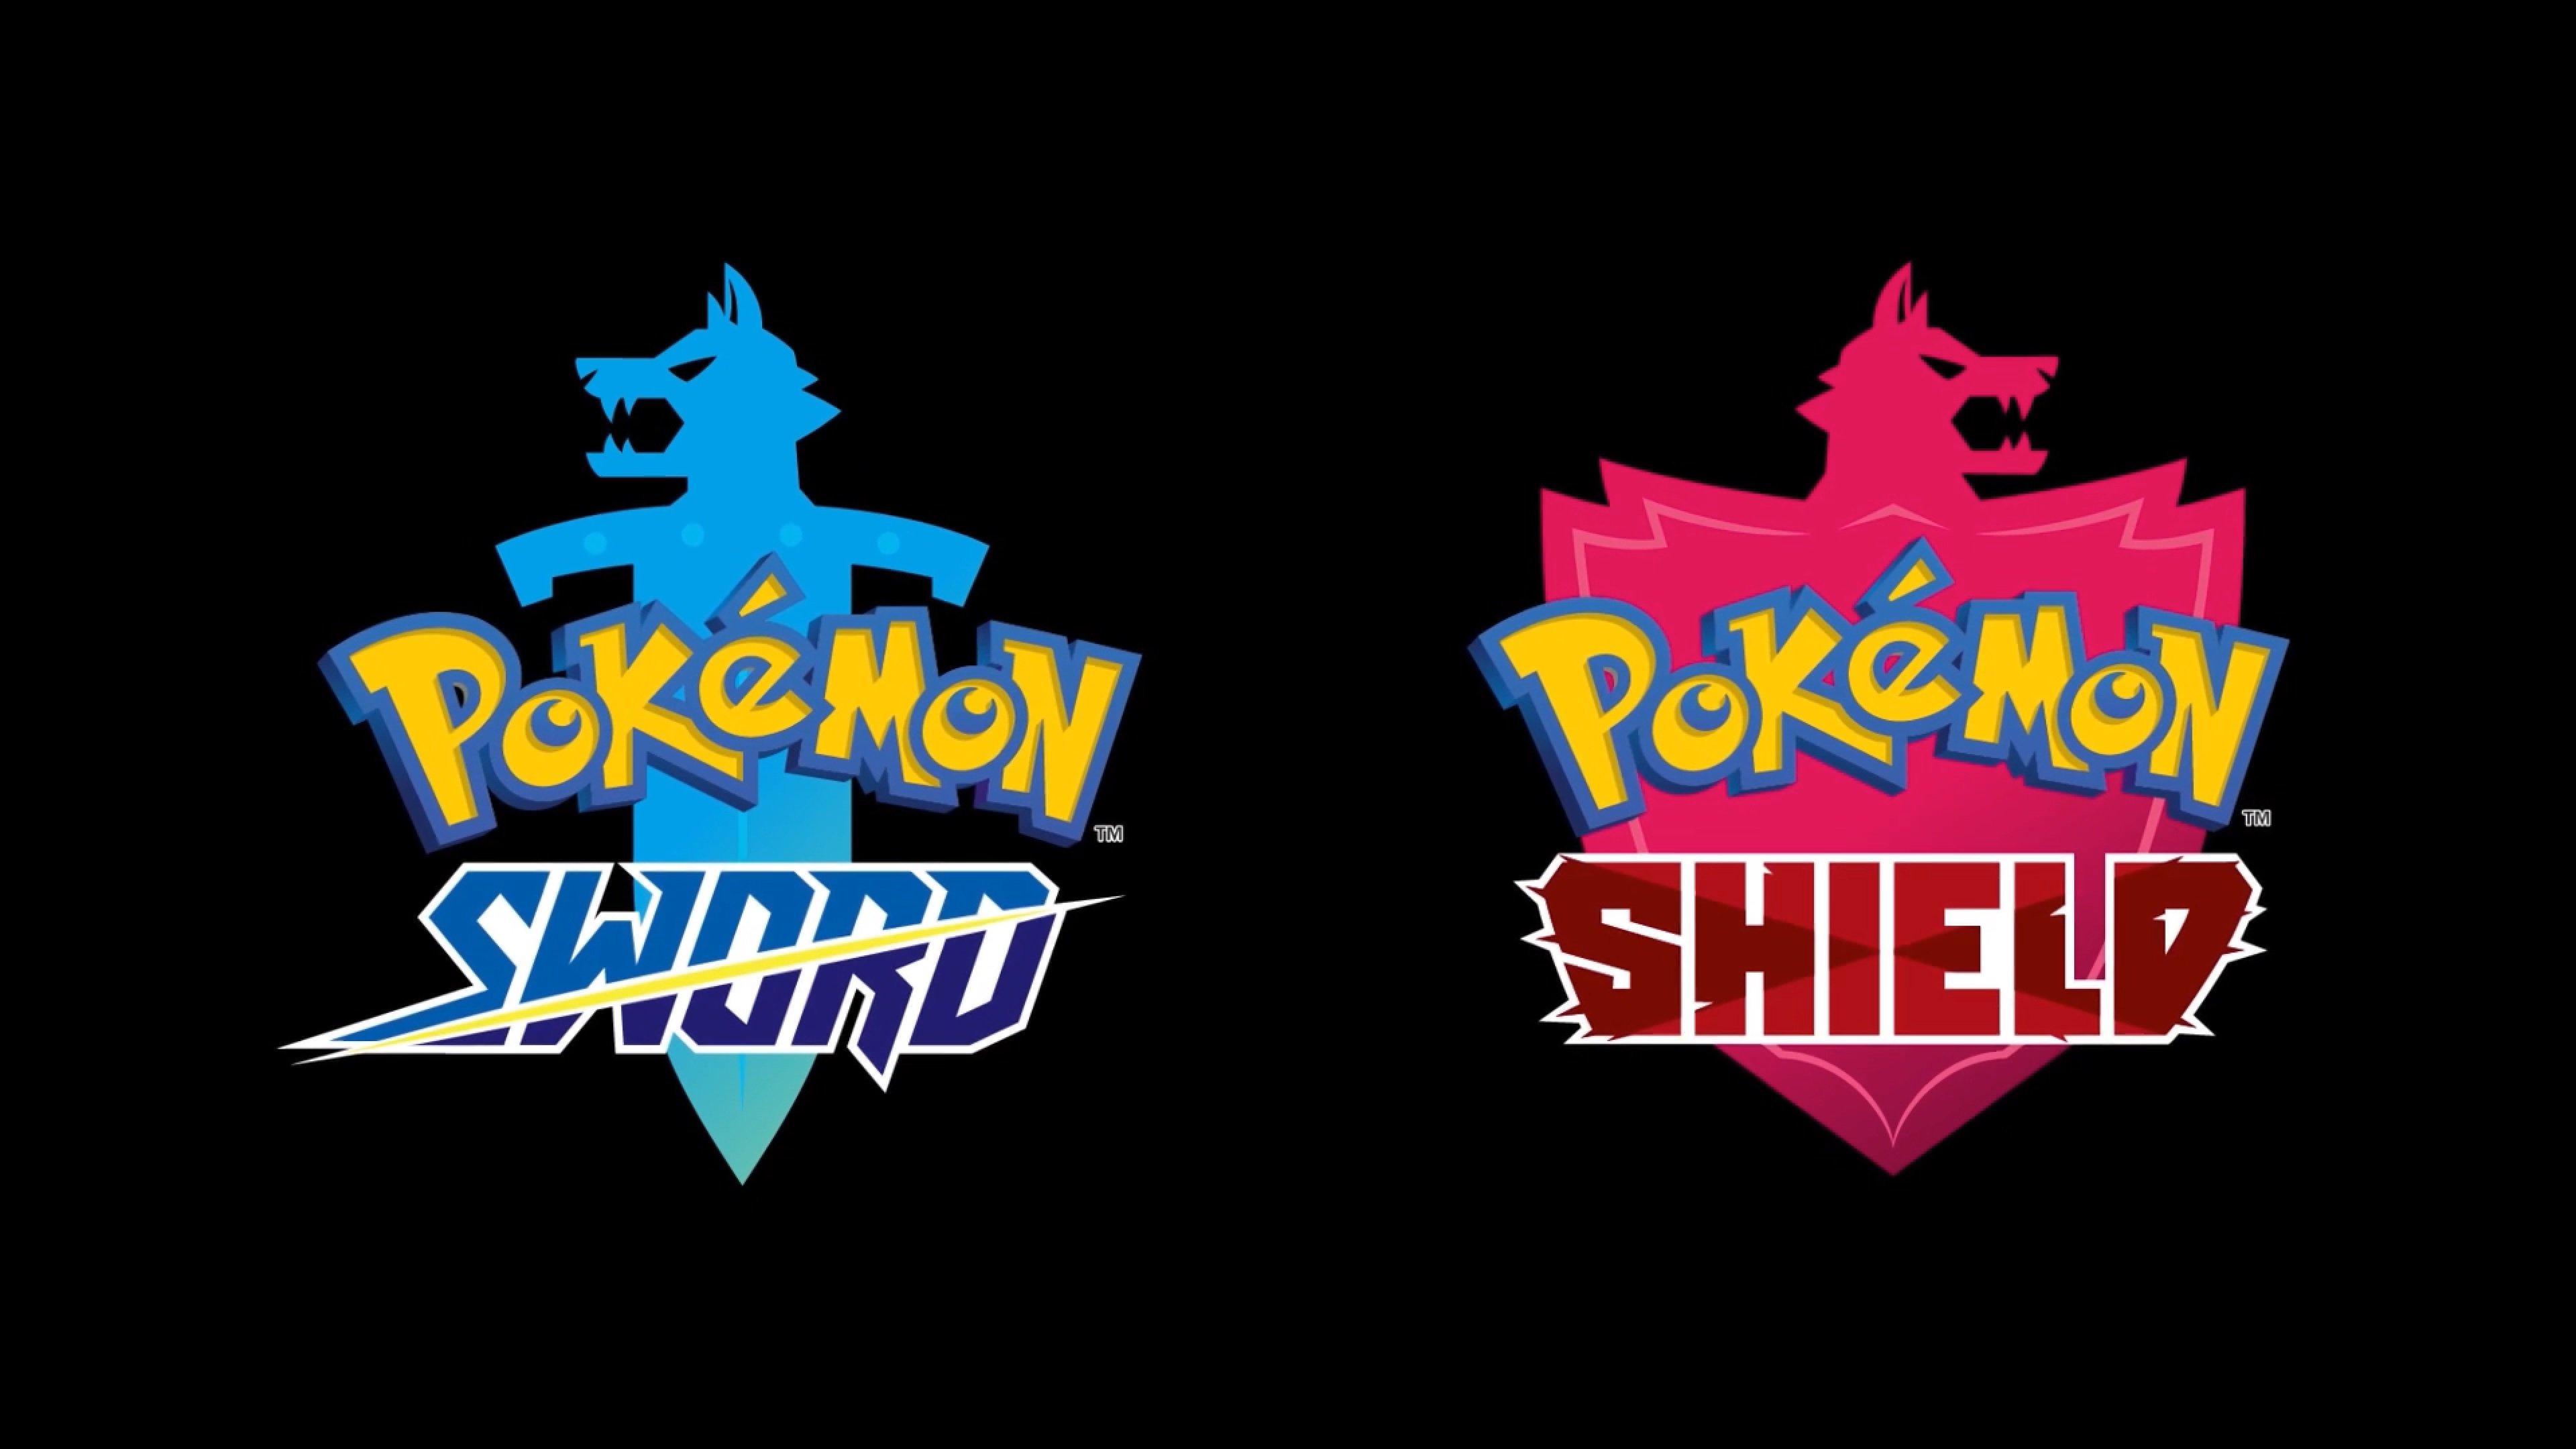 The Pokémon Company anuncia Pokémon Sword e Pokémon Shield para o Nintendo Switch